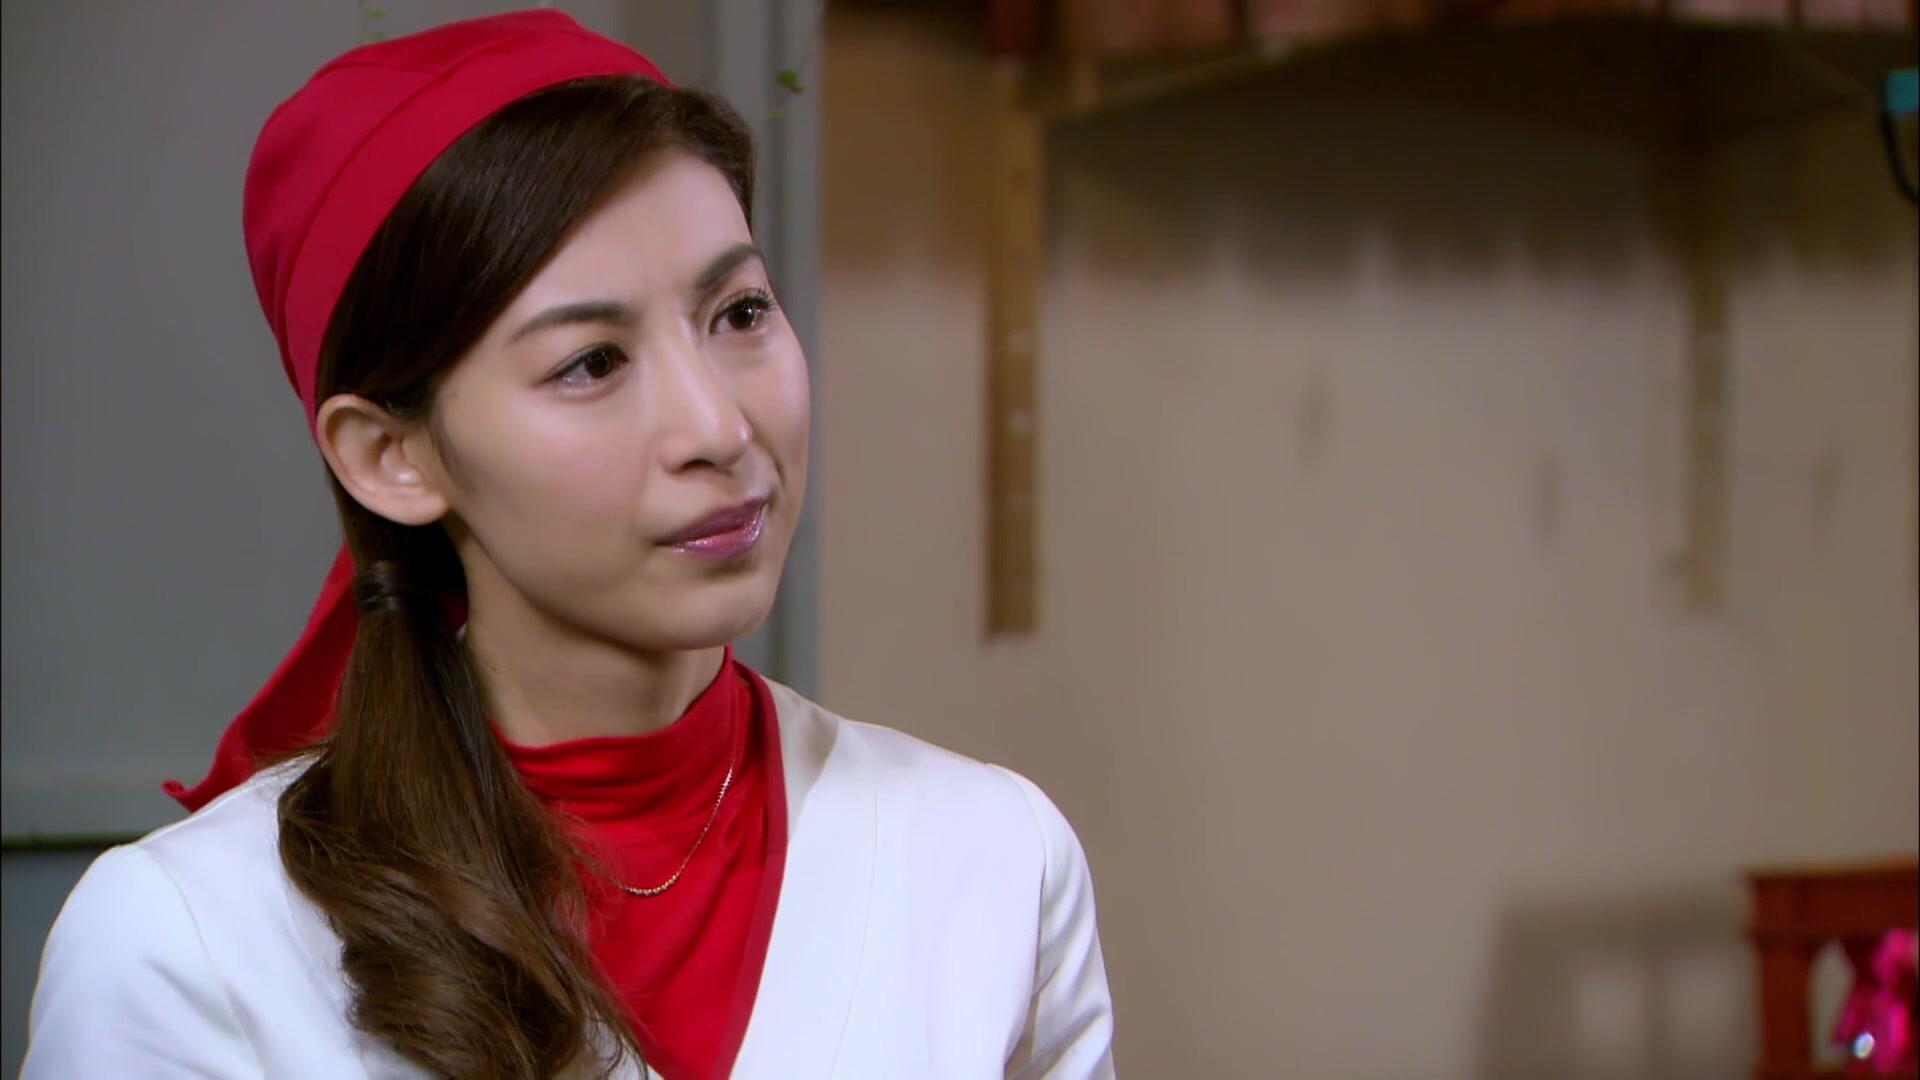 Shia Wa Se Episode 5